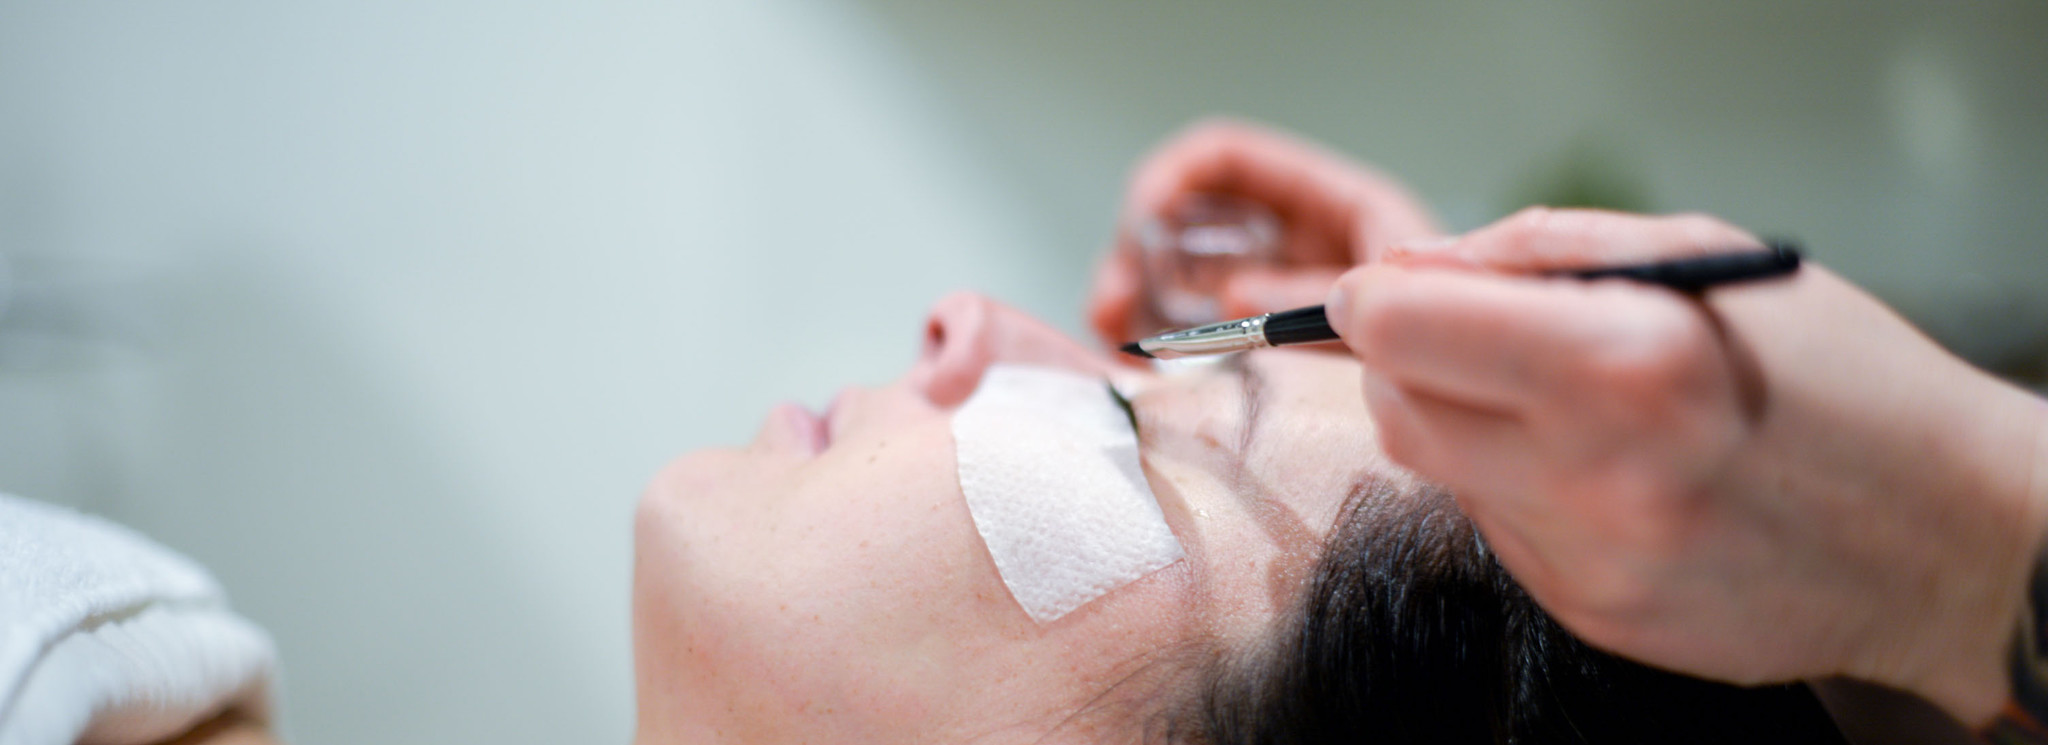 Eye Brow Tint Eye Lash Tinting Full Face Waxing In New Hampshire